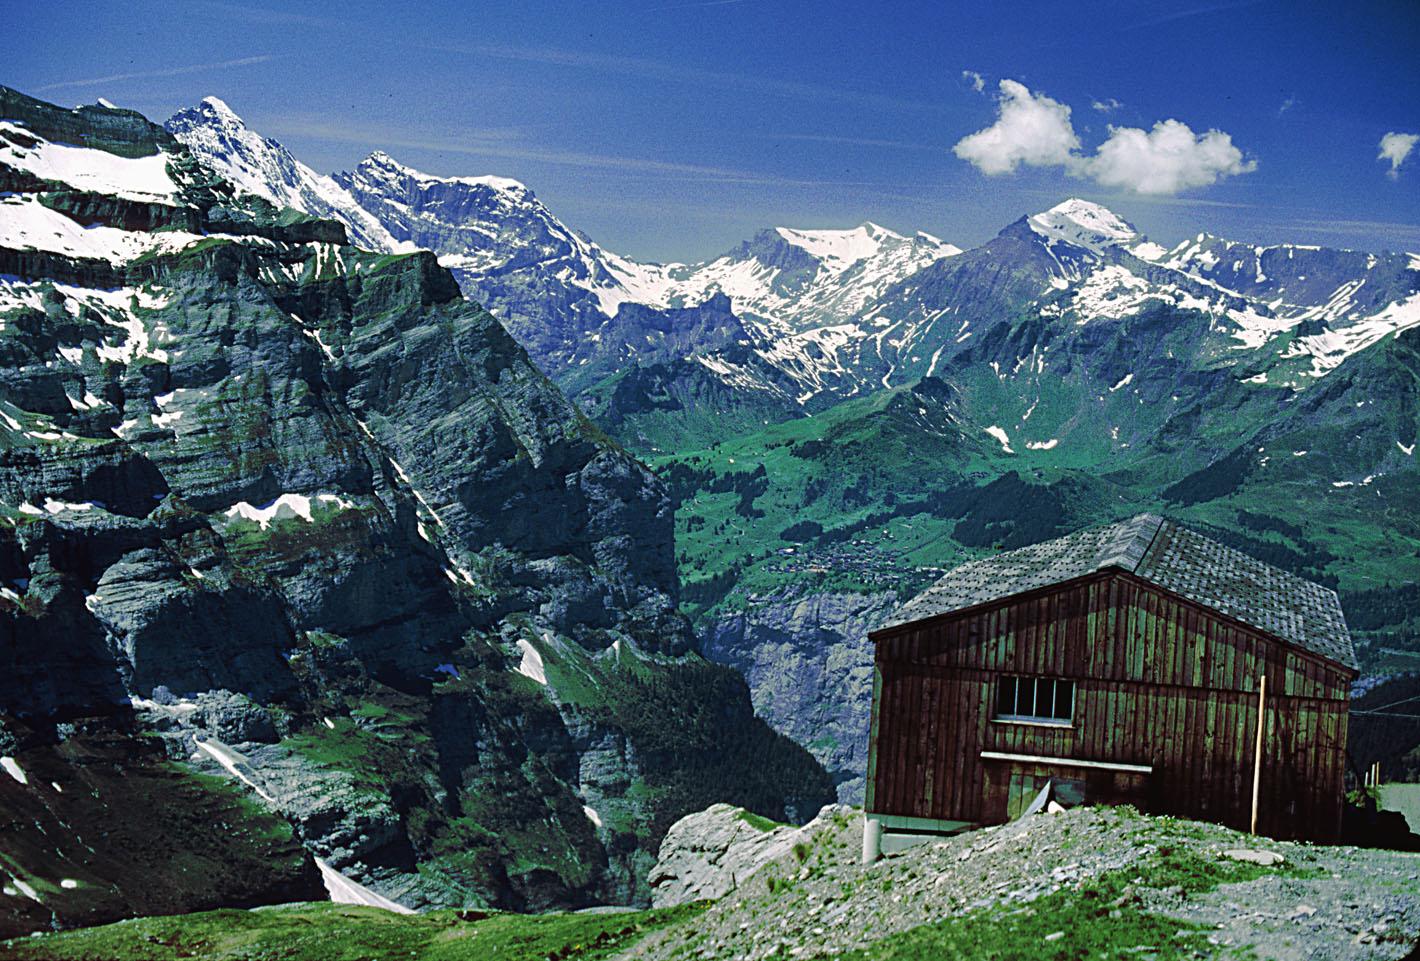 http://mstecker.com/images/Europe/Switzerland/Switzerlandphotos/a27switz2a.jpg